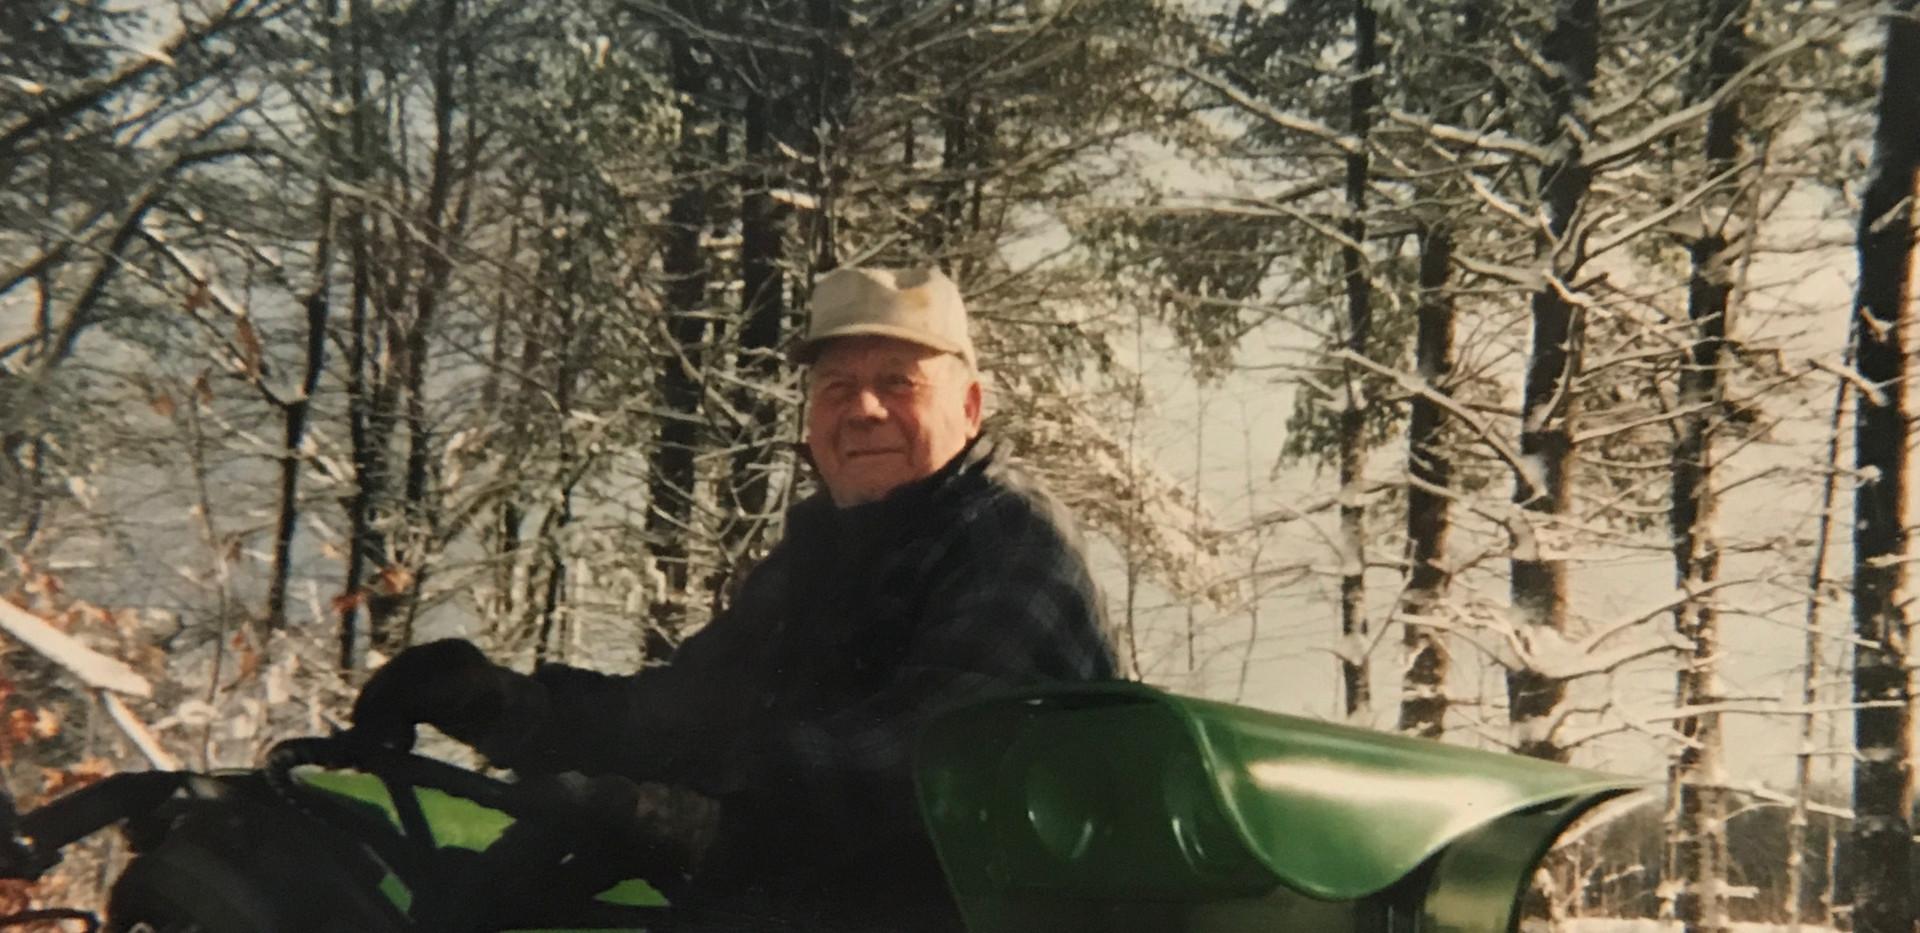 Farmer Othro (Tom) Sawyer atop his John Deere tractor